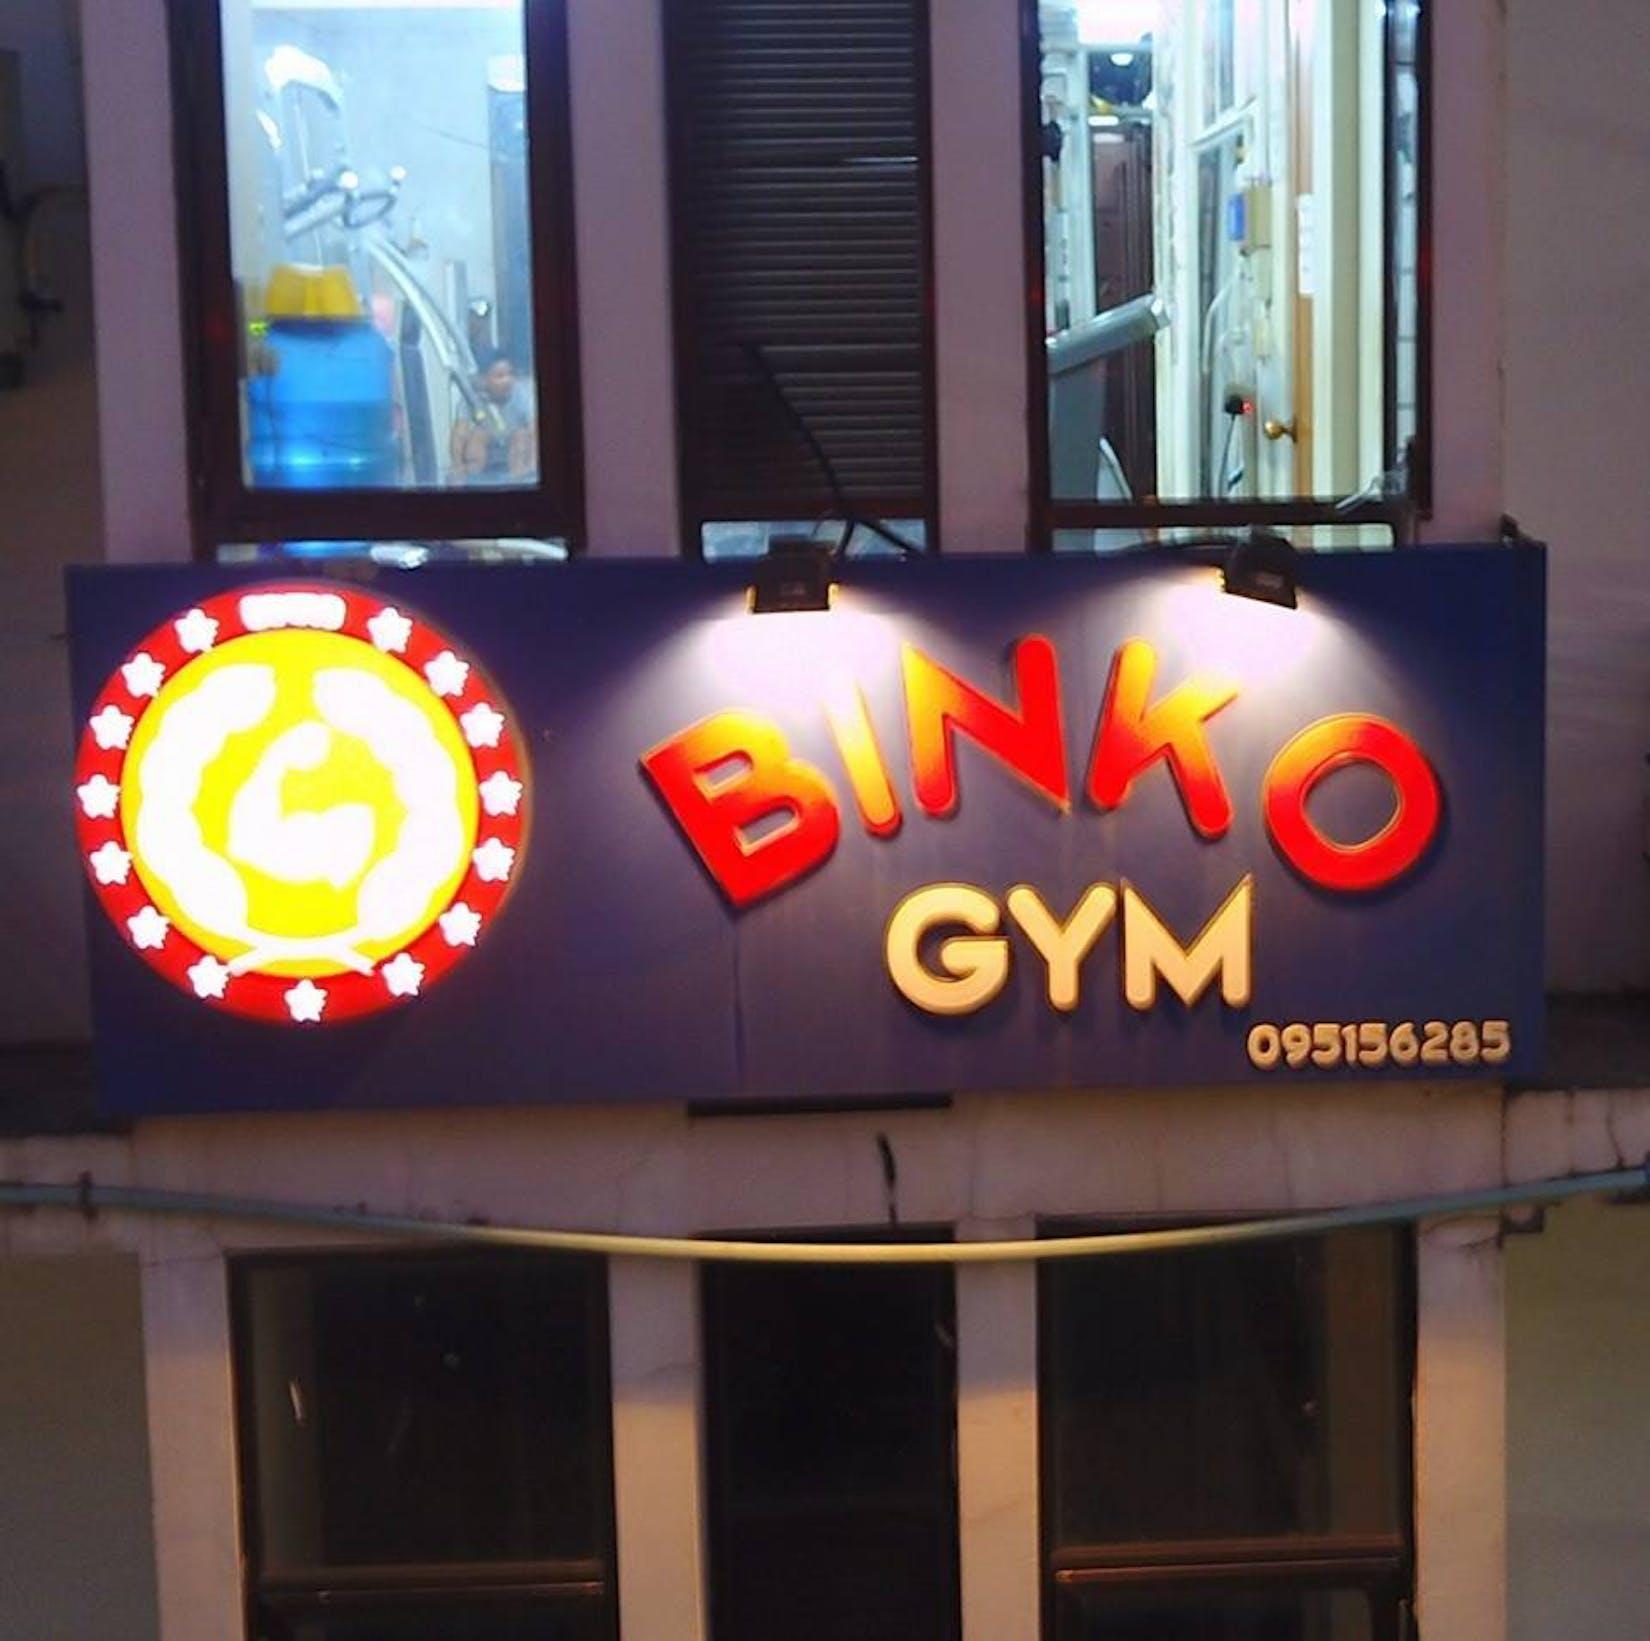 Binko Gym | Beauty